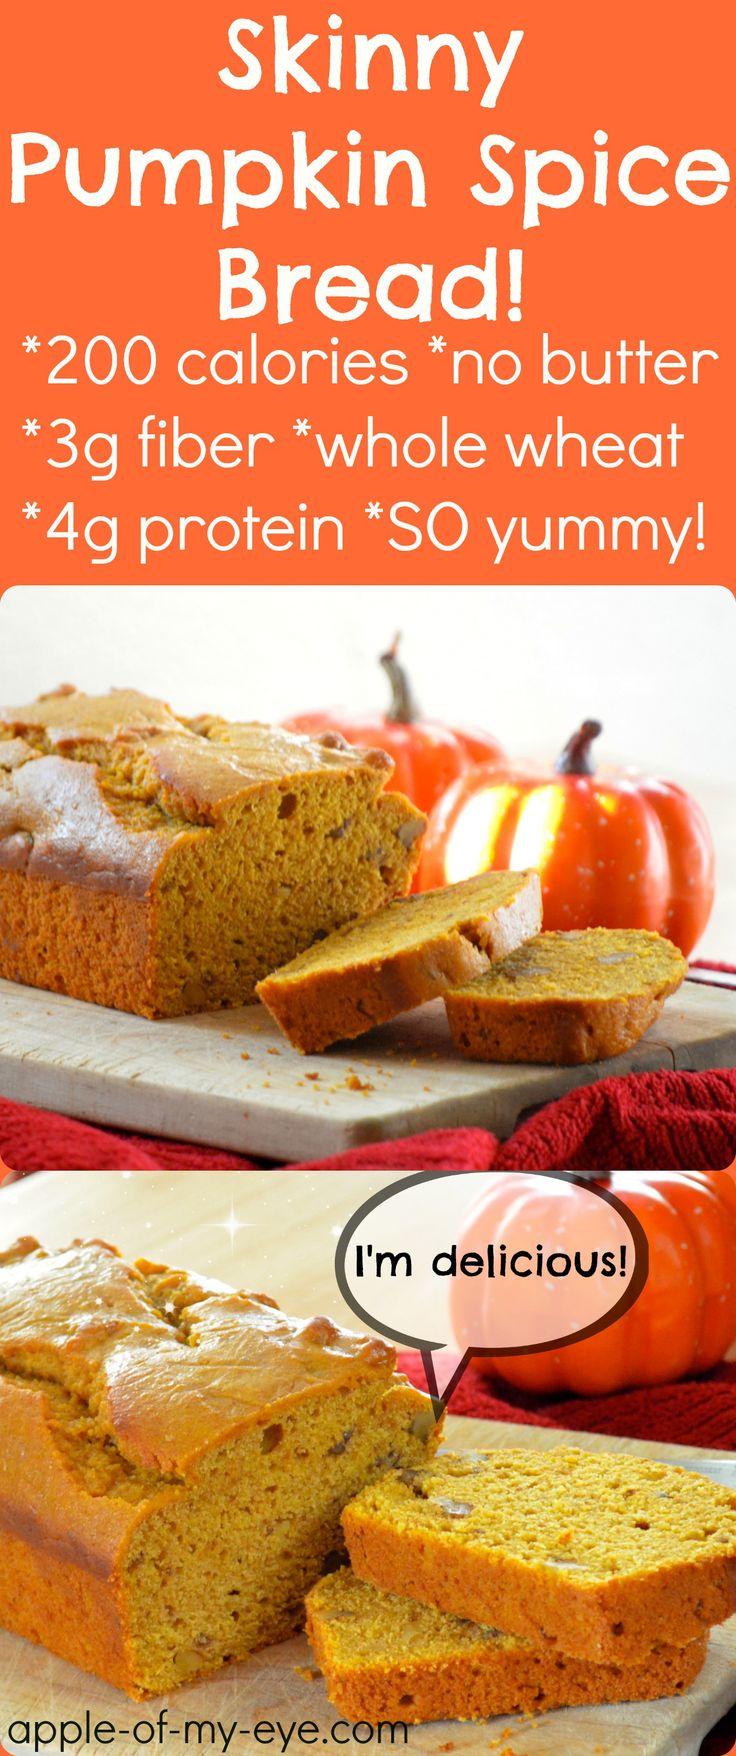 Skinny Pumpkin Spice Bread